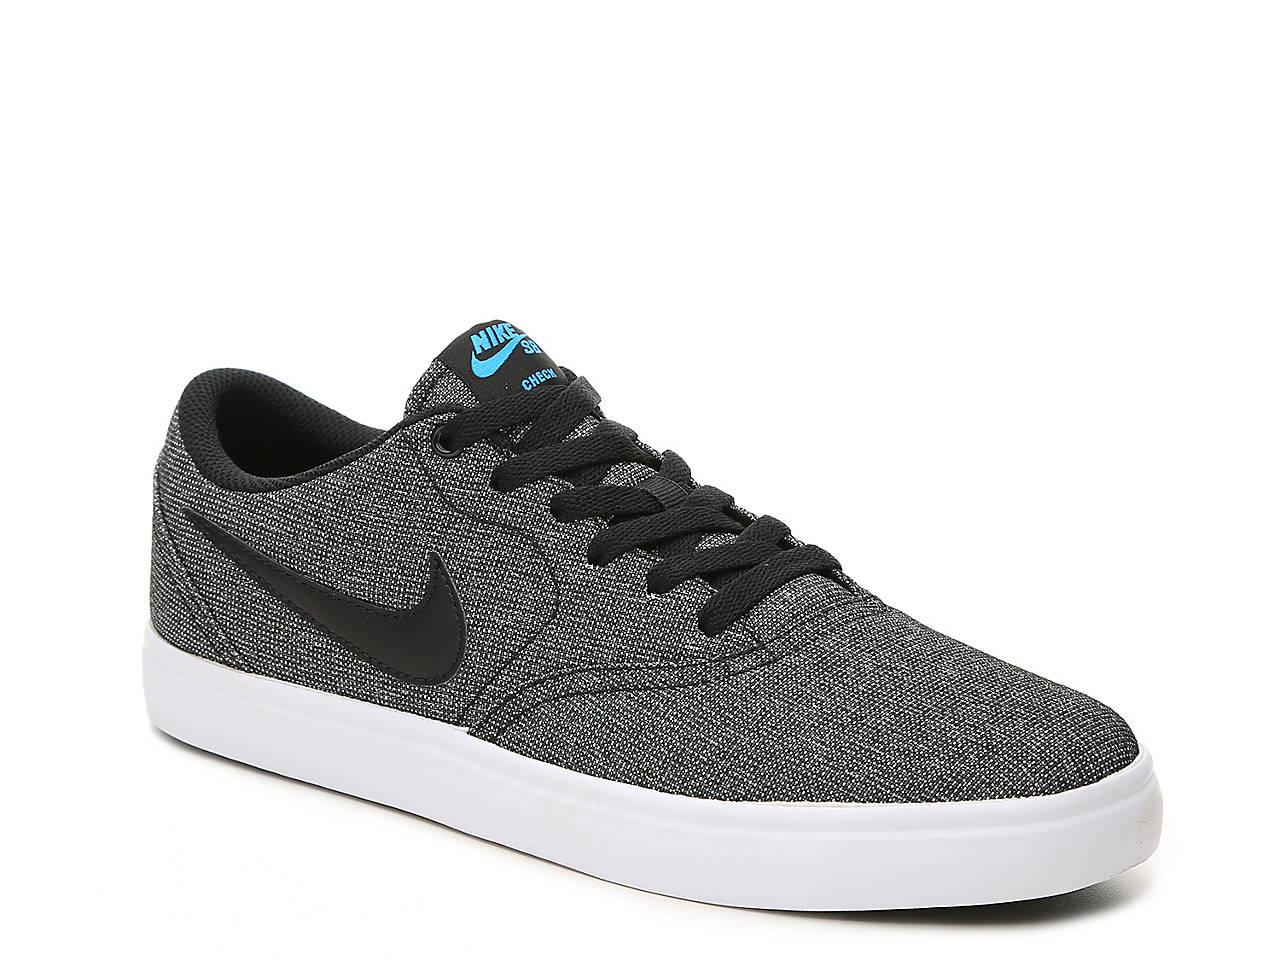 SB Check Solarsoft Sneaker Men's